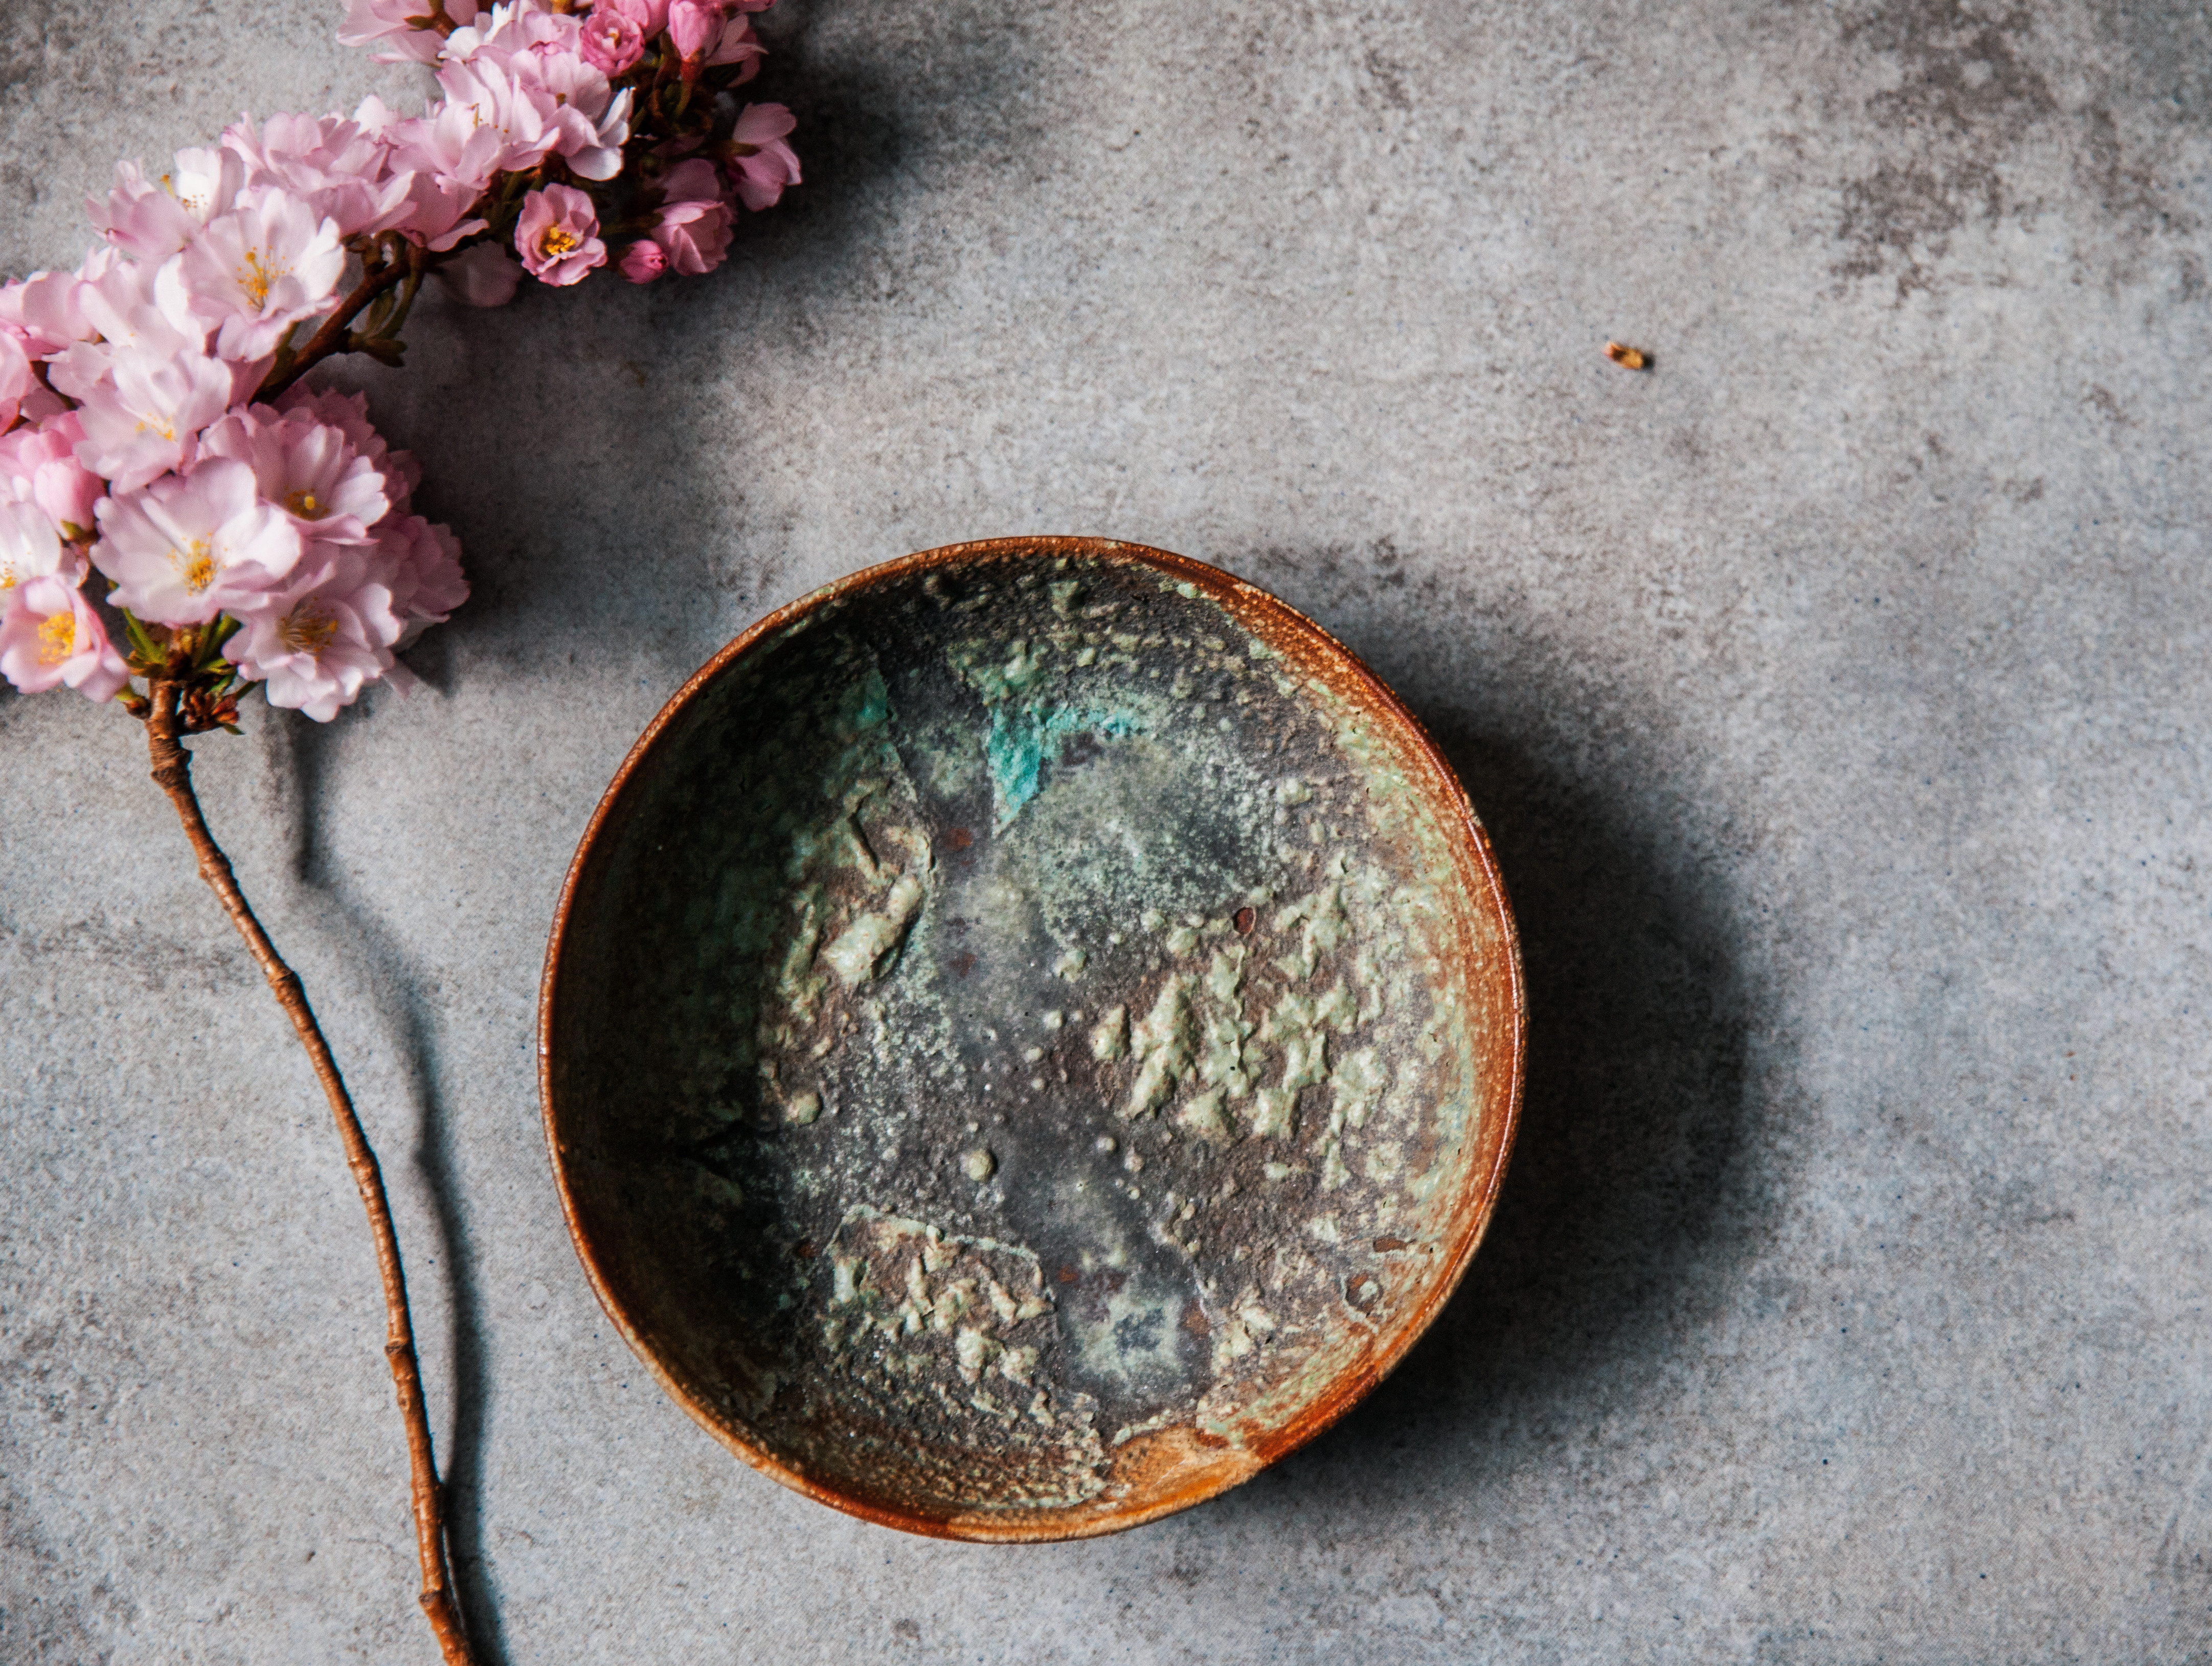 Keramik - intresseanmälan